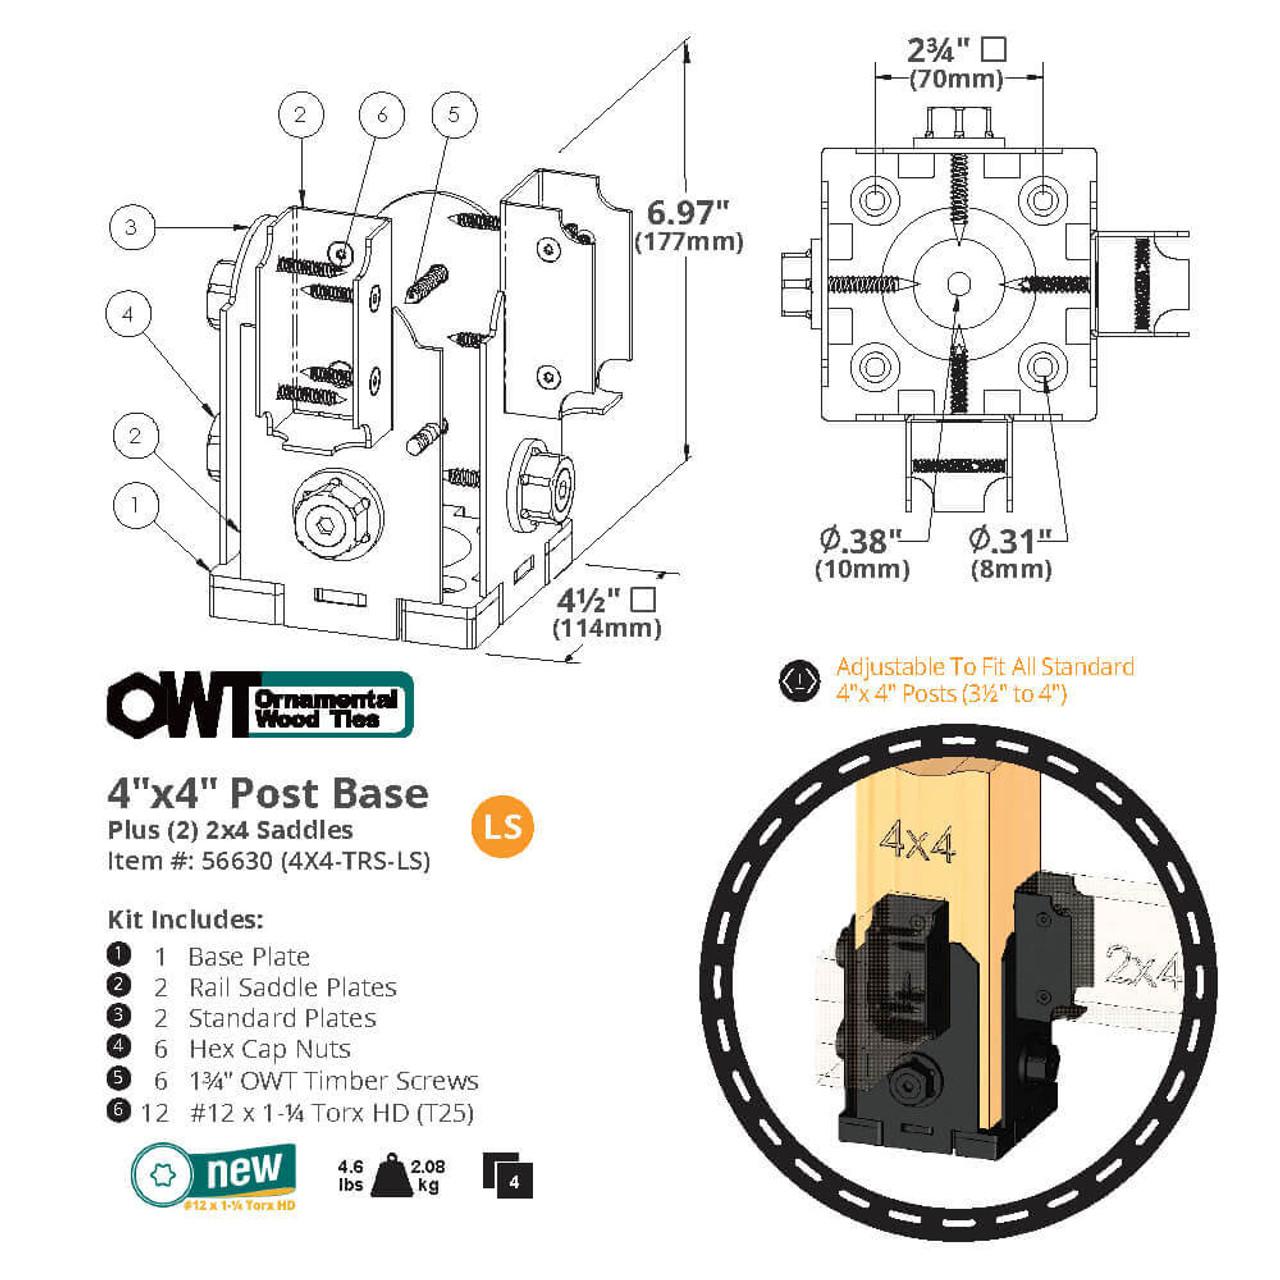 OZCO 4X4TRS-LS Post Base Twin Rail Saddle Dimension Drawing